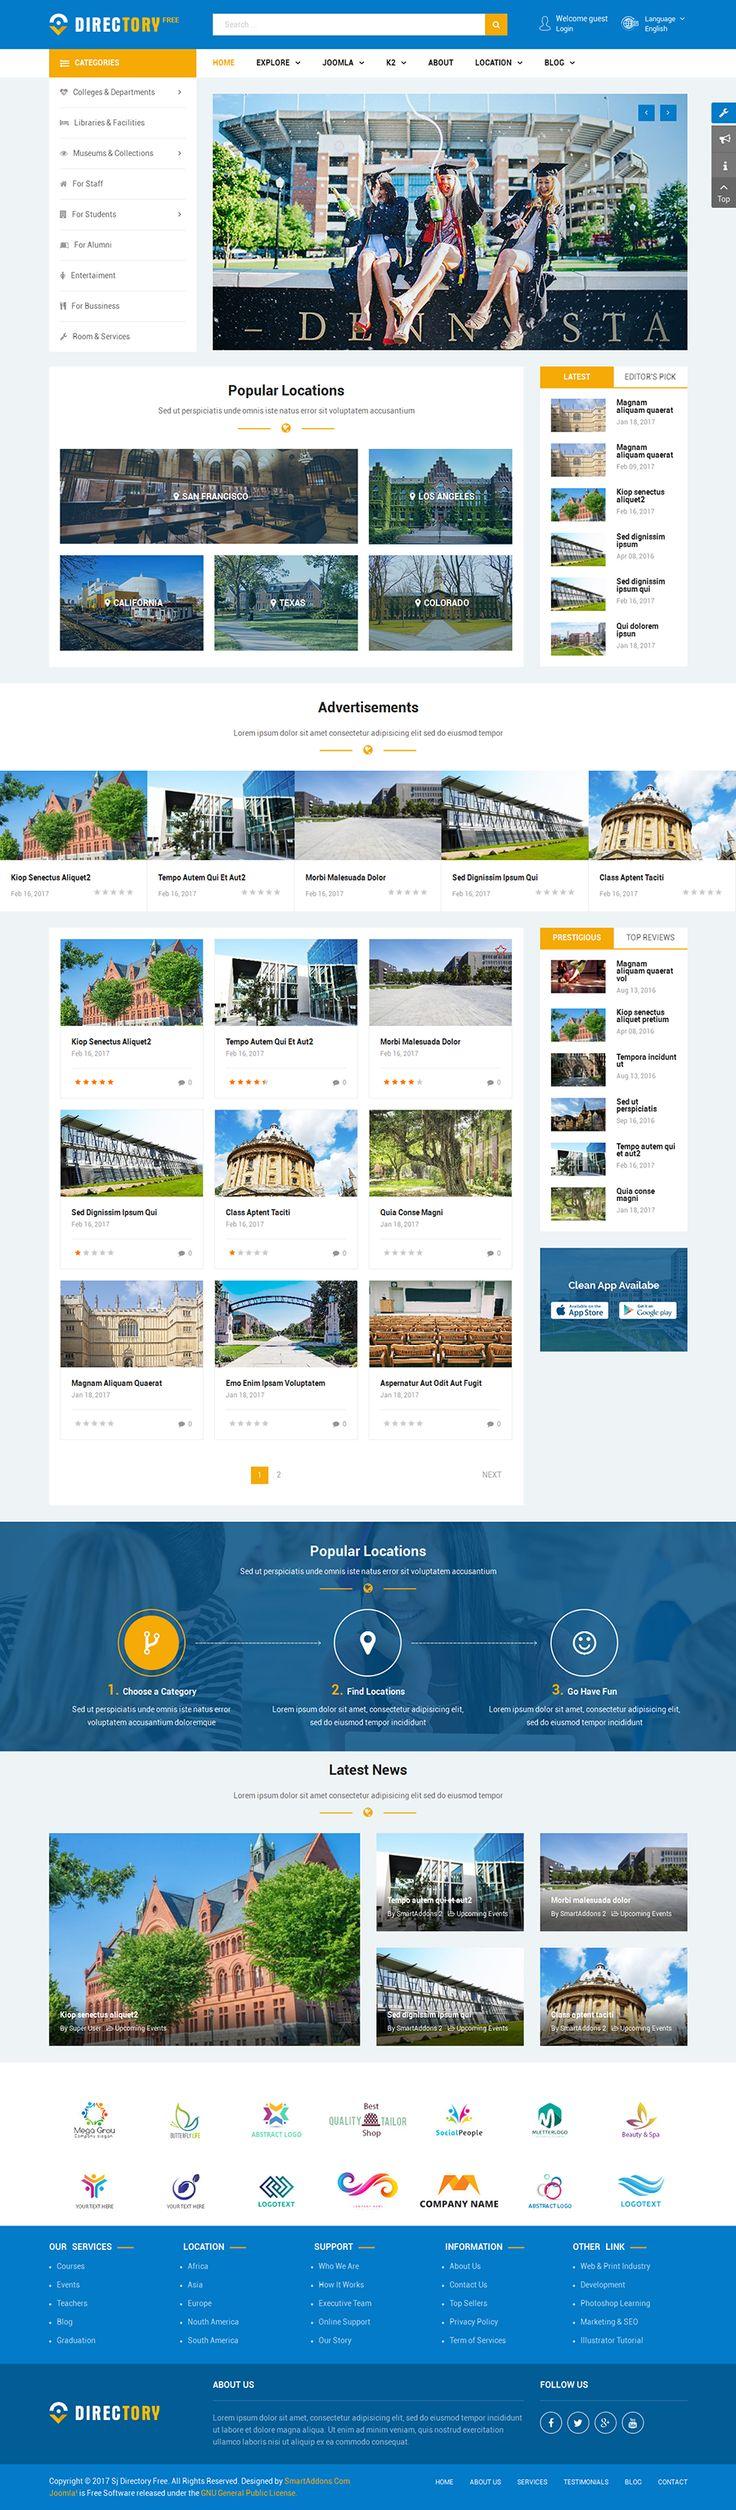 19 best Free Joomla Templates images on Pinterest | Joomla templates ...